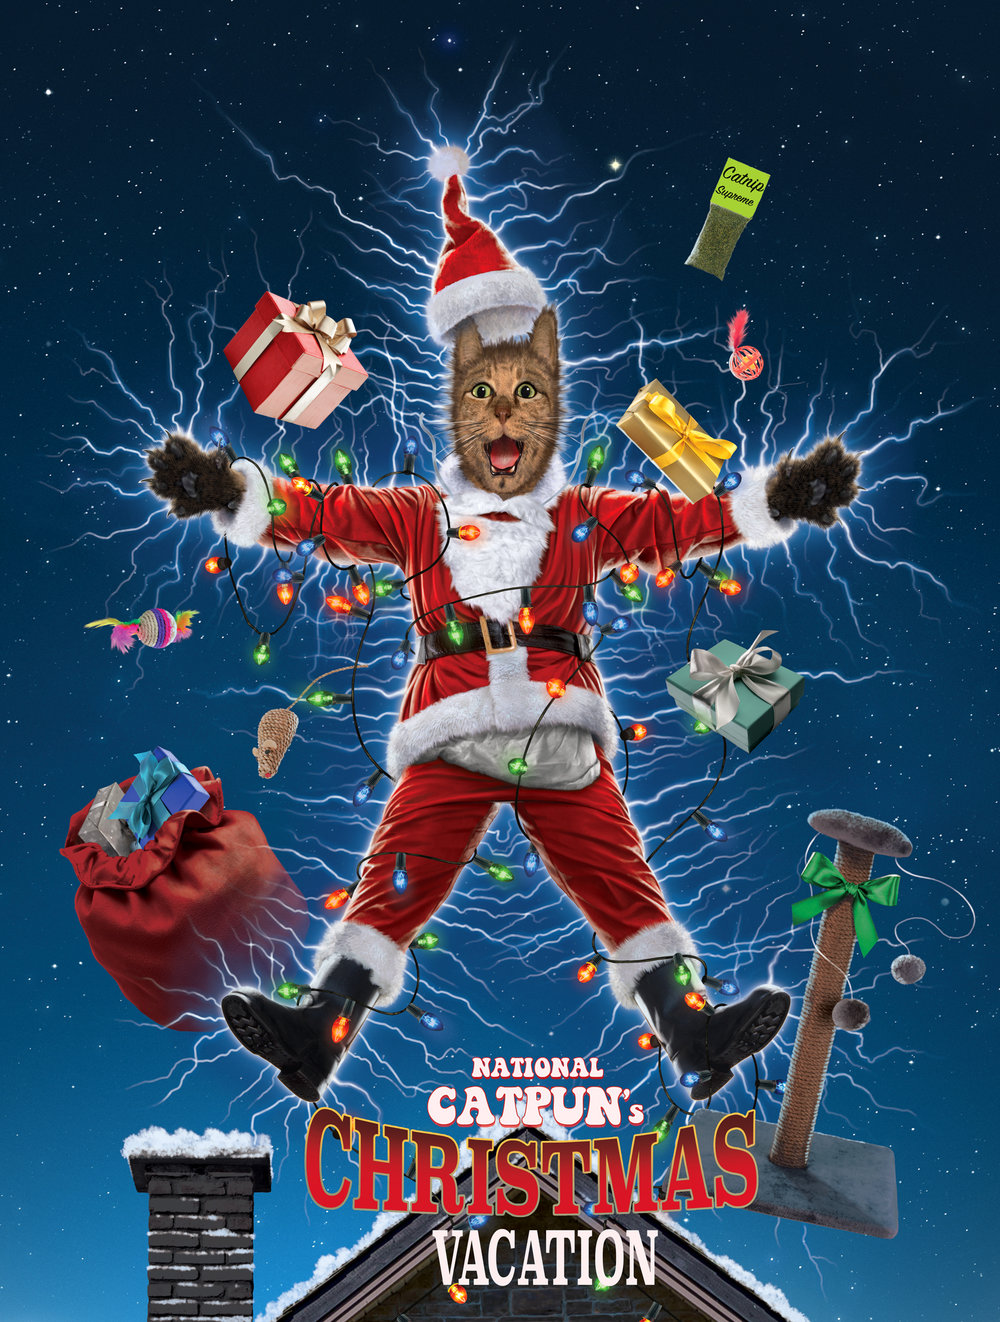 National catpun's Christmas Vacation version 2.jpg